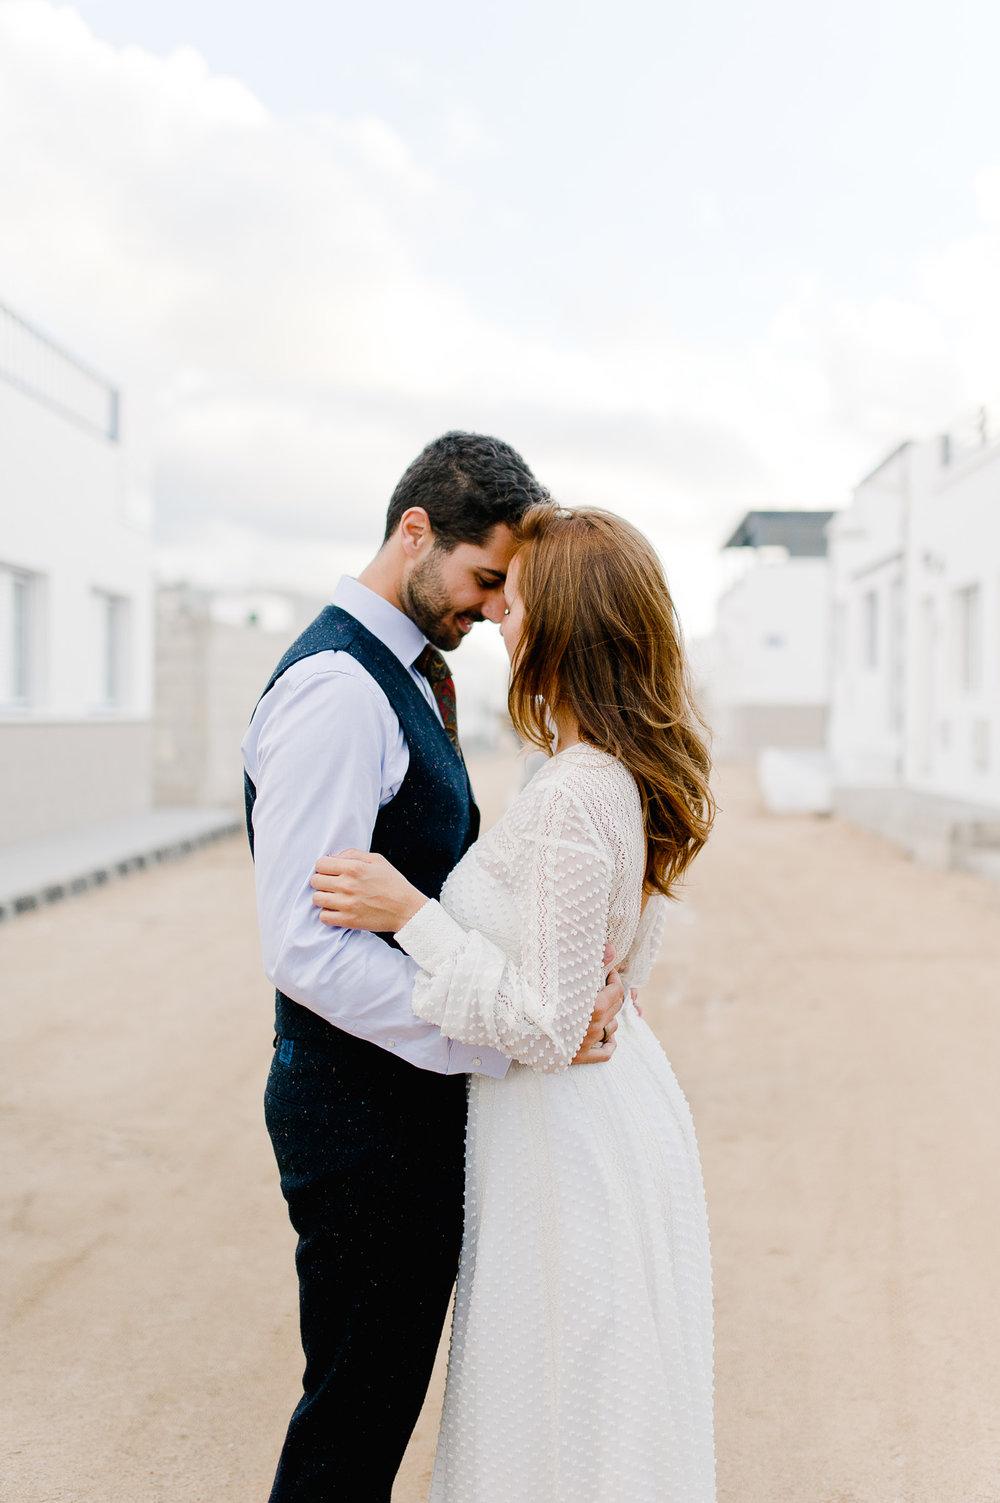 anna hari wedding photography-9.jpg